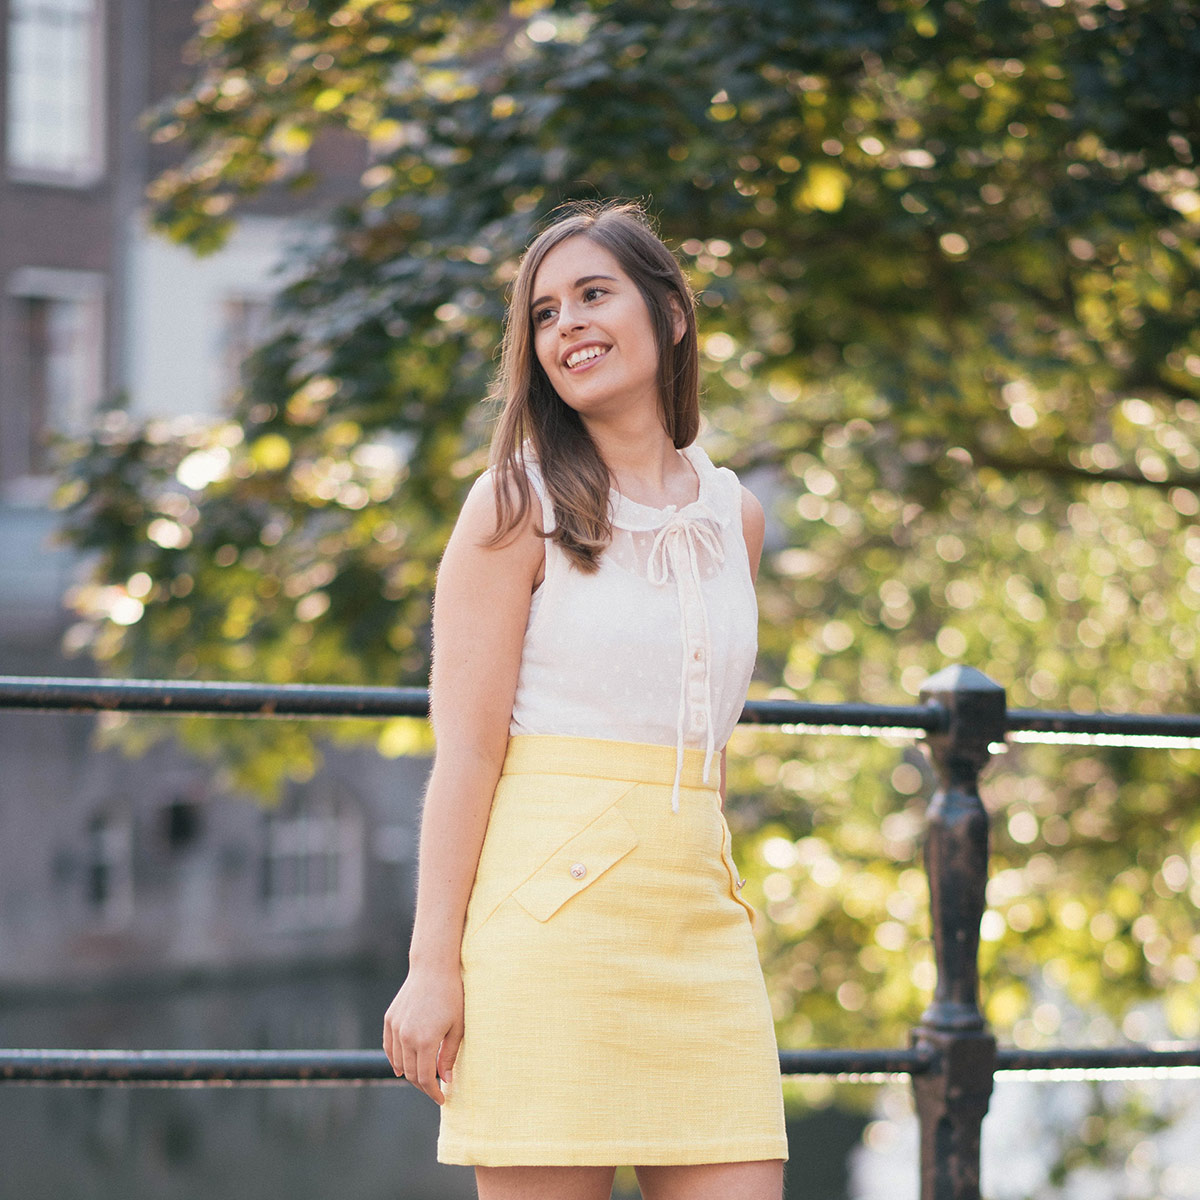 chanel-inspired-skirt-burda-thepetitecat-7